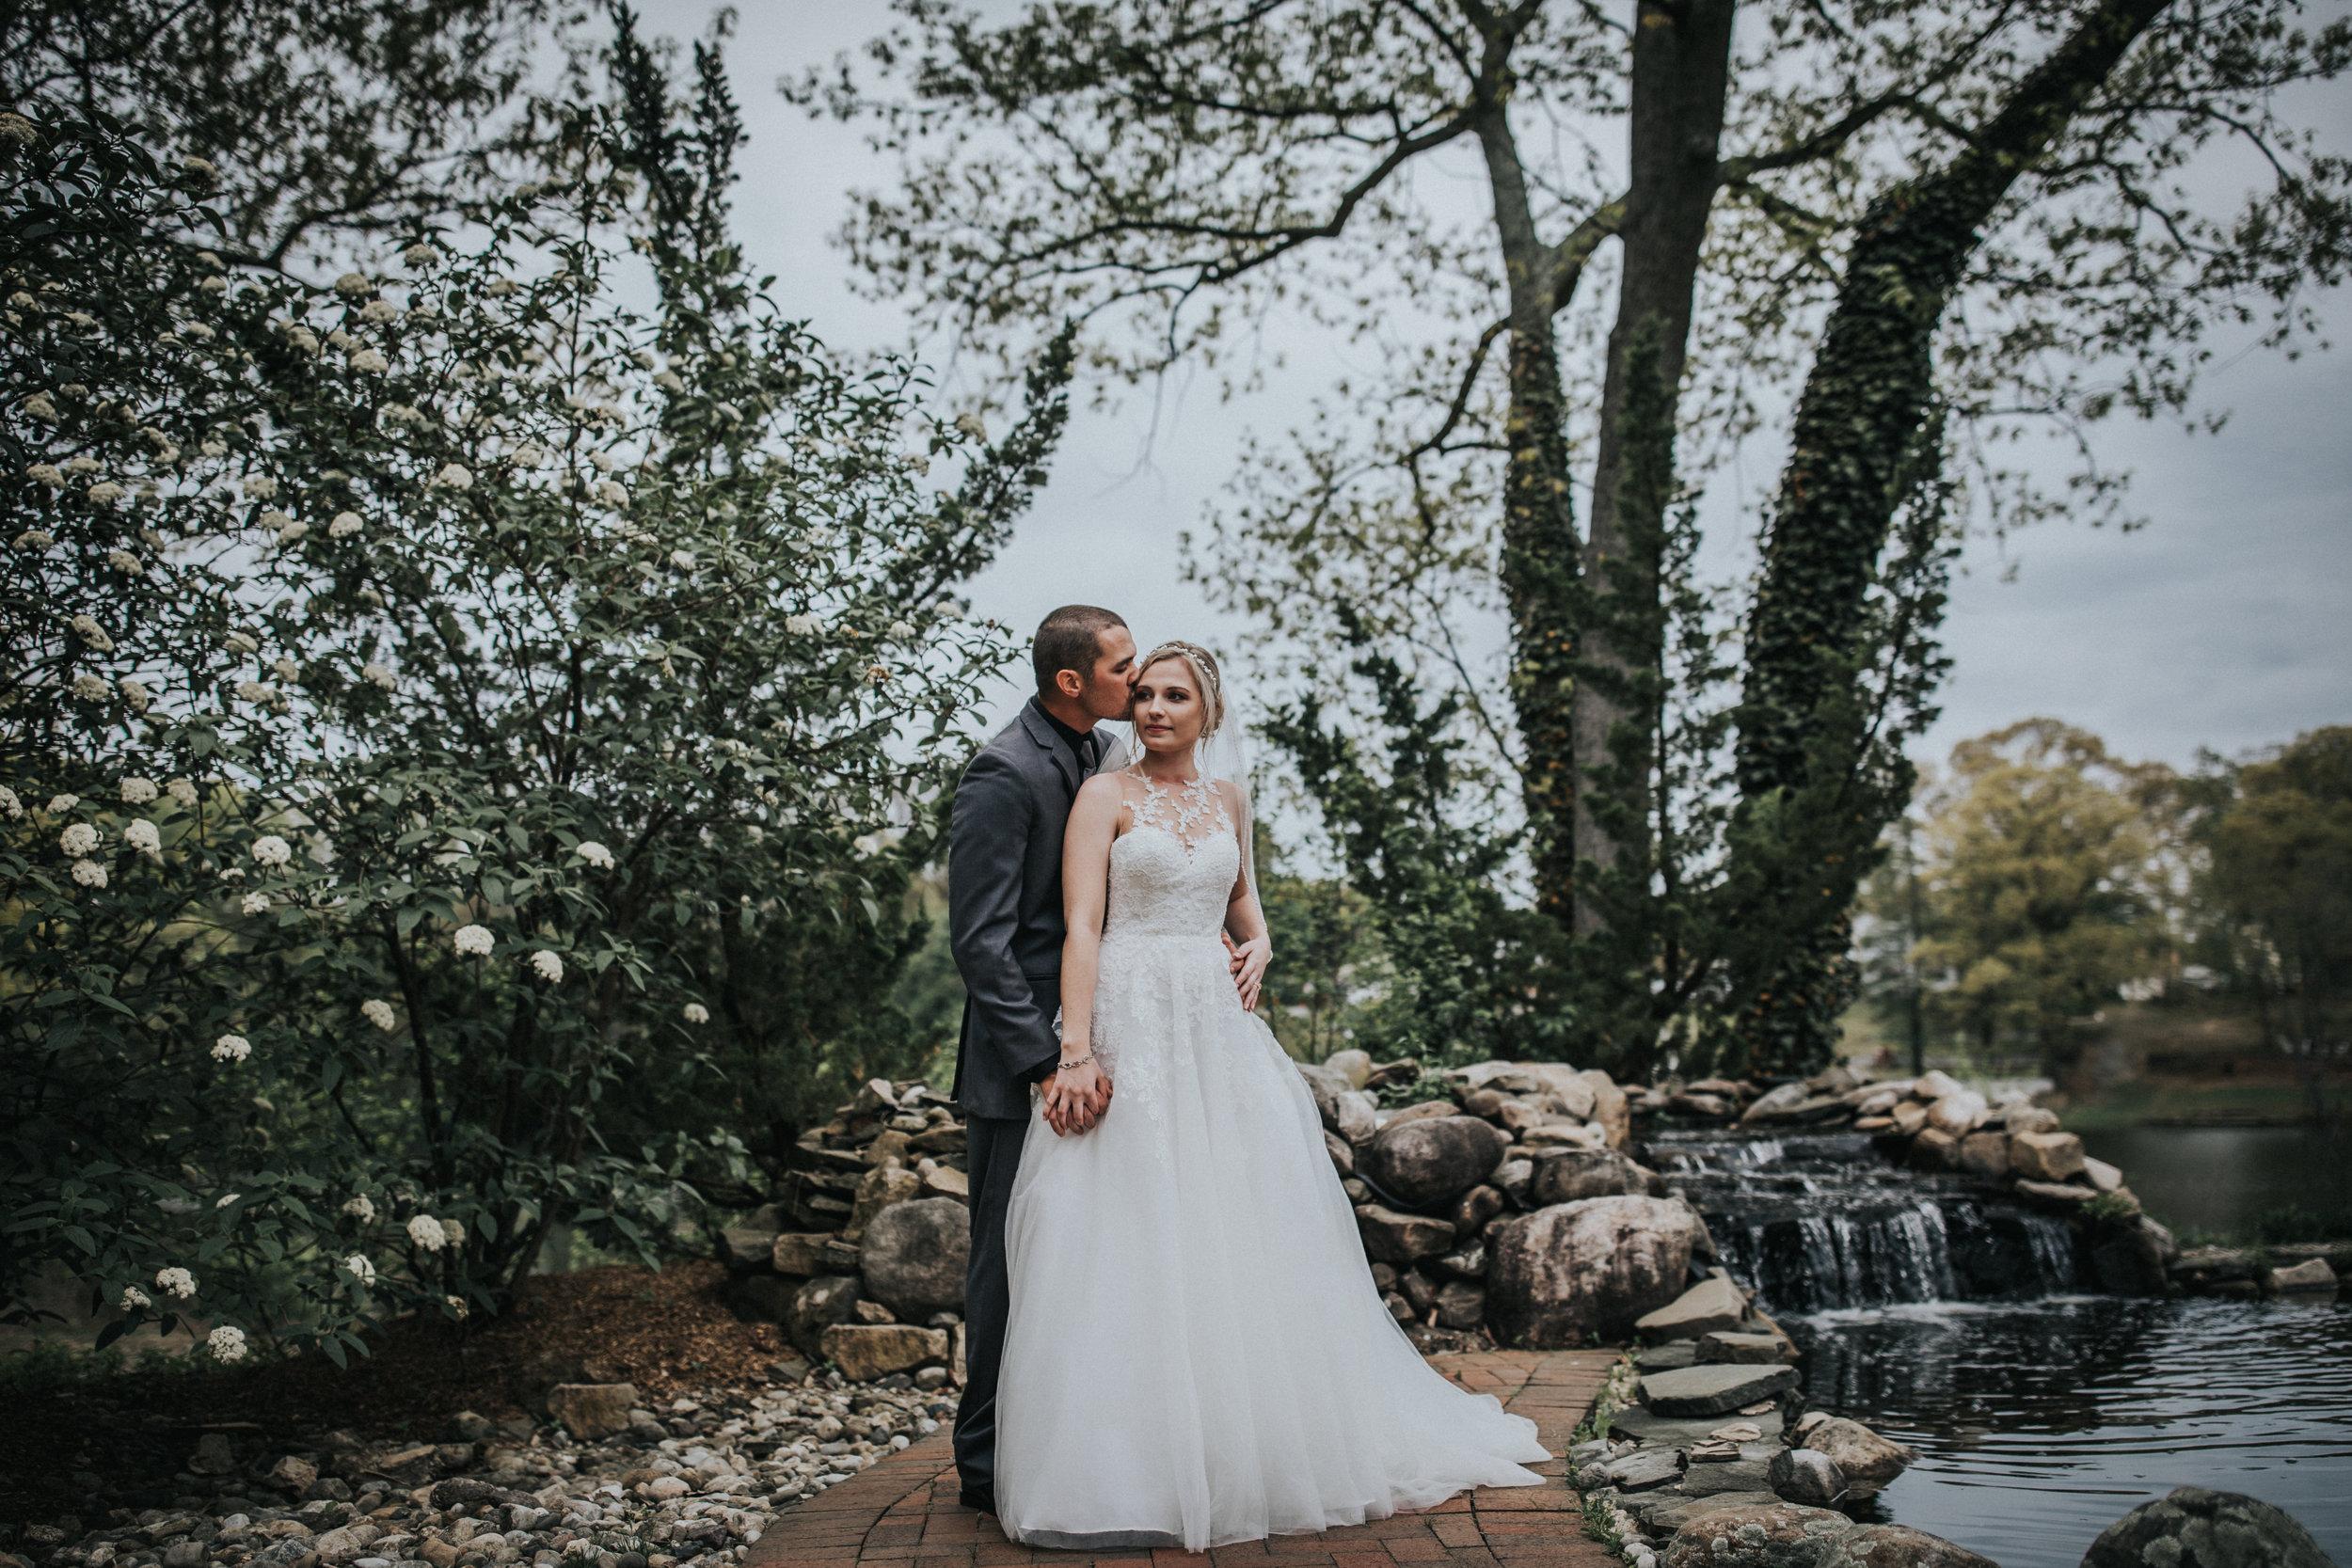 New-Jersey-Wedding-Photographer-Megan&Nick-BrideandGroom-17.jpg